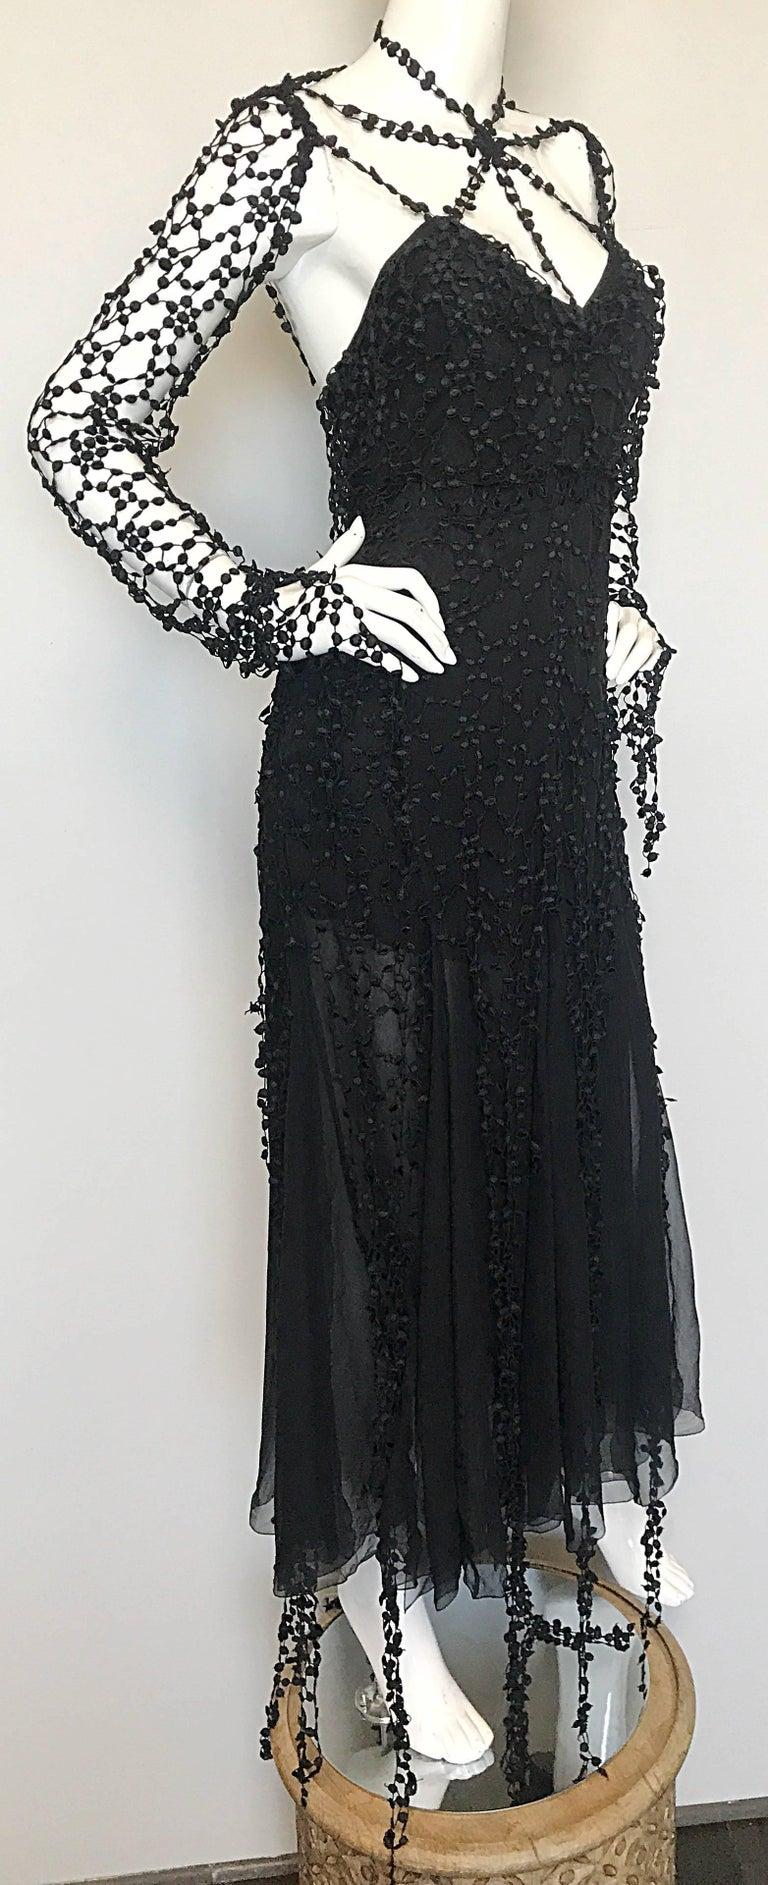 1990s Karl Lagerfeld Vintage ' Spiderweb ' Black Silk Chiffon Vintage 90s Dress 6